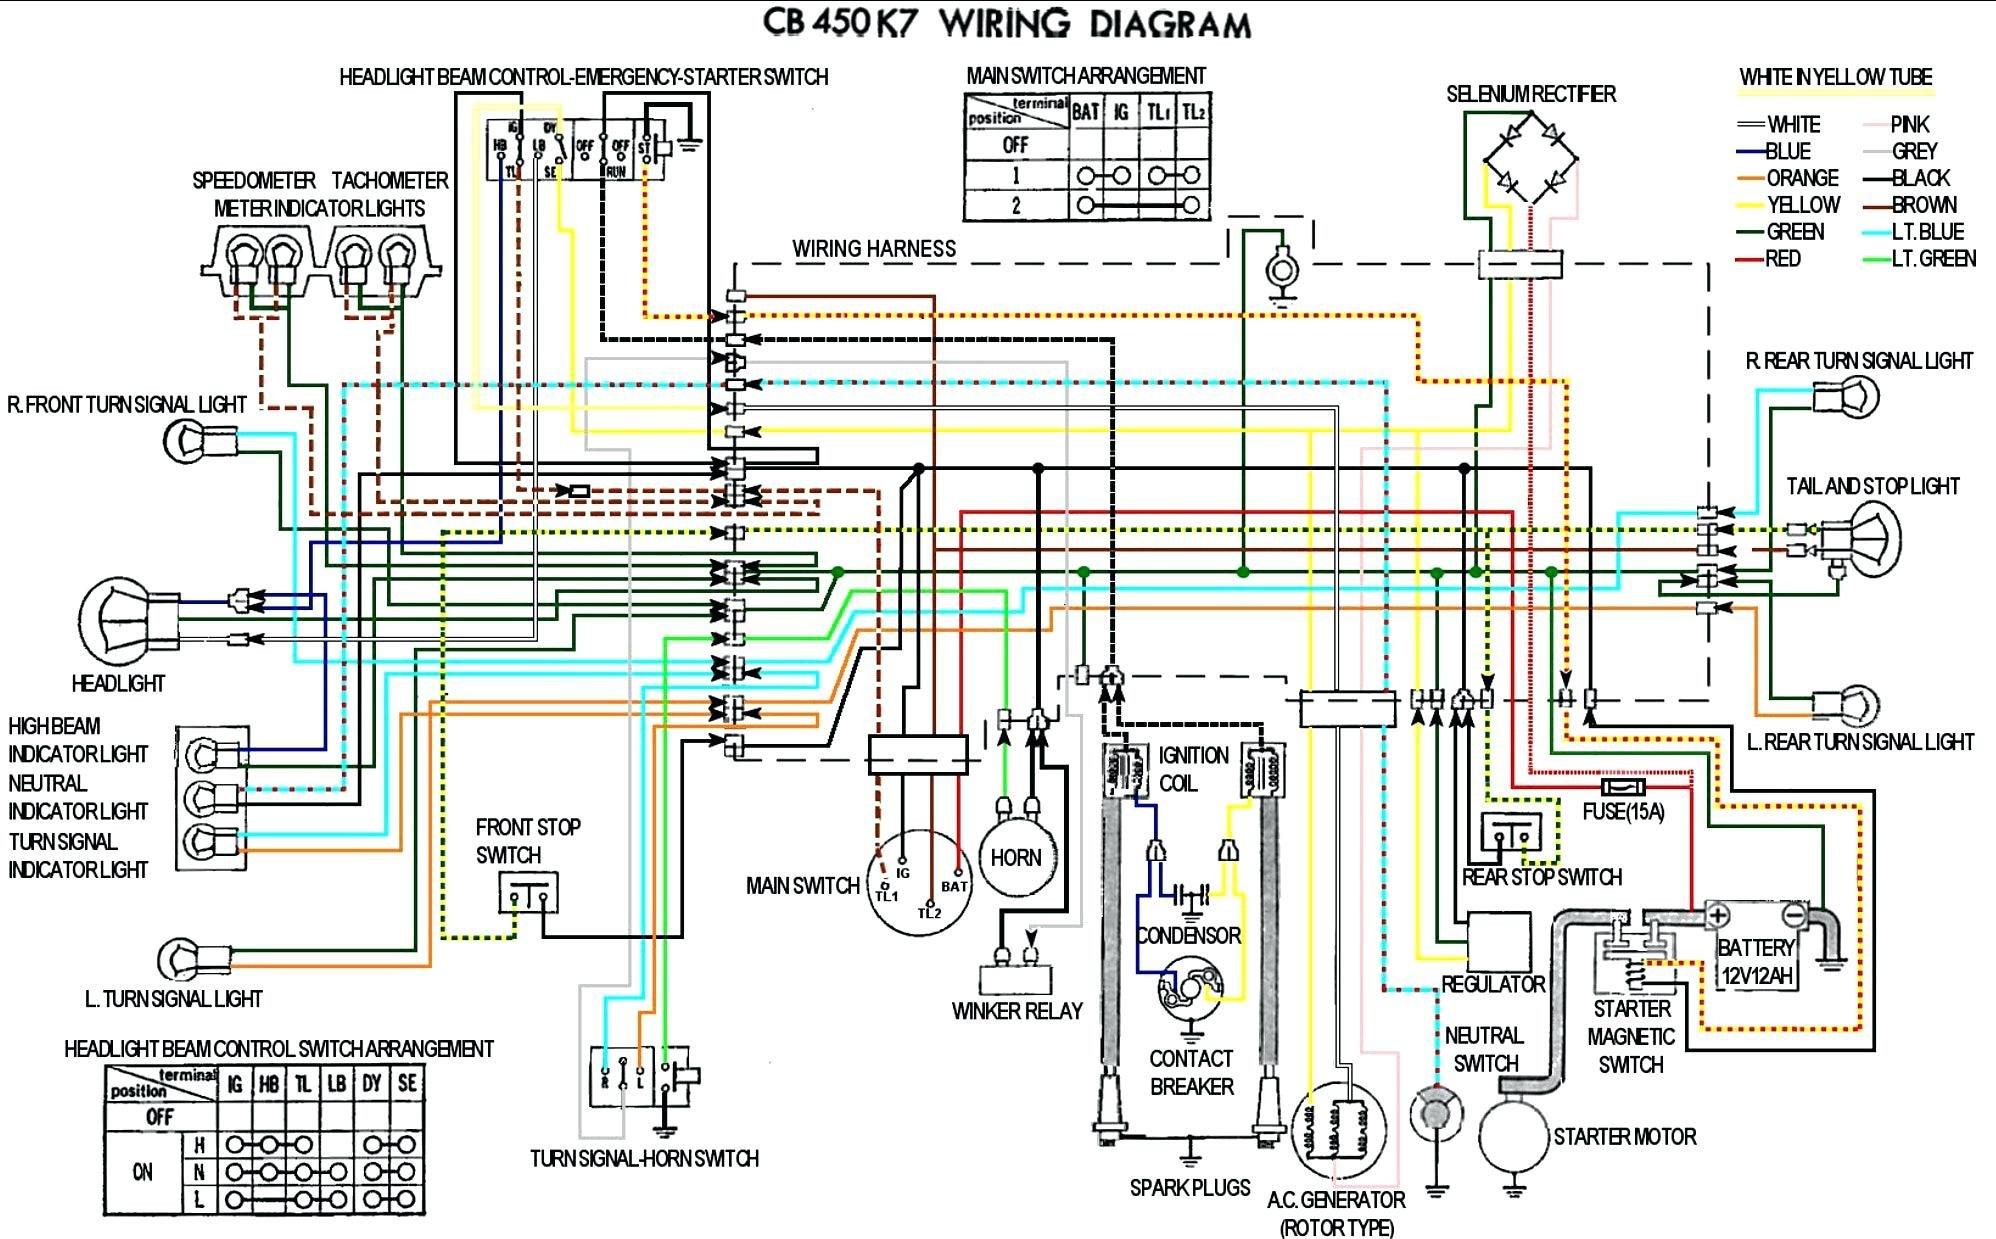 Wiring Diagram For John Deere Lt155   Manual E-Books - John Deere Lt155 Wiring Diagram